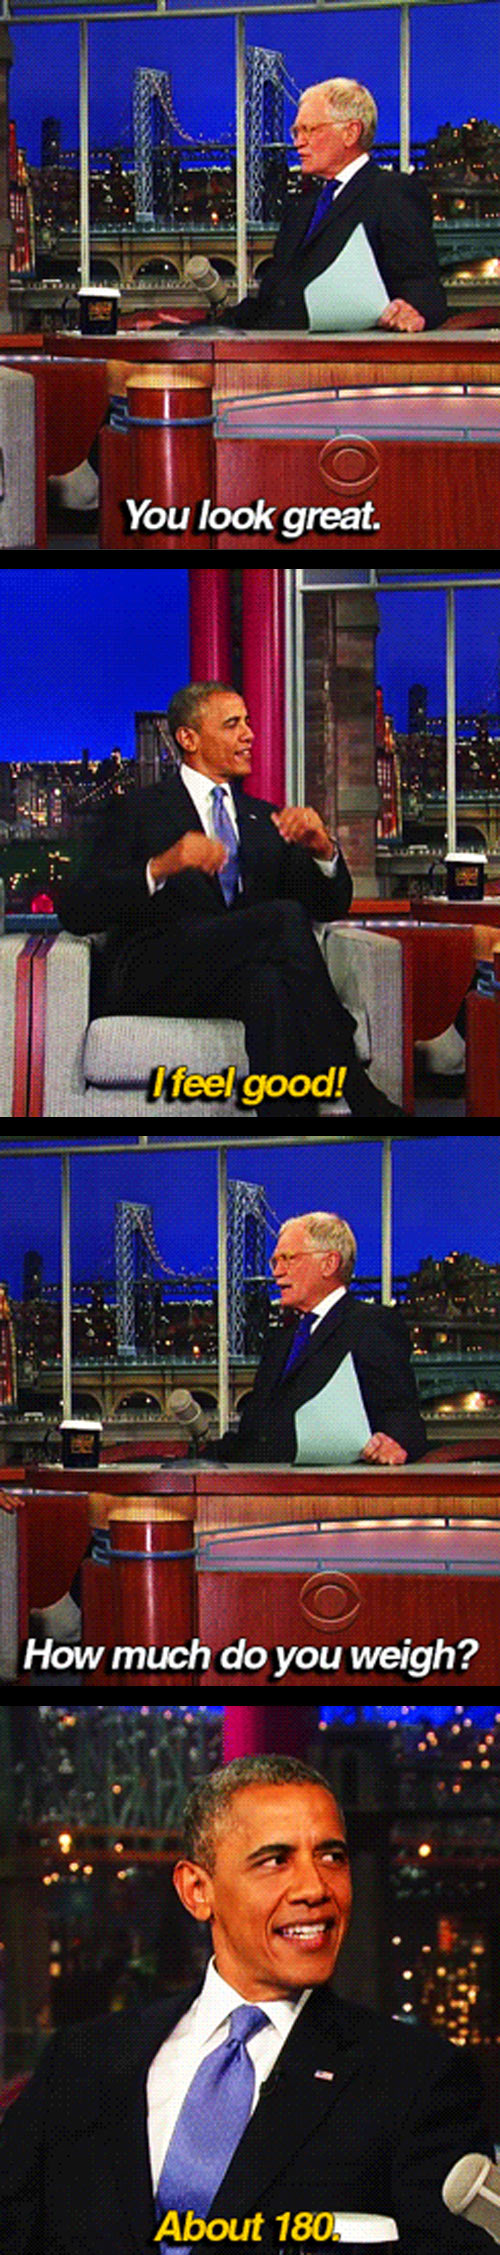 funny-Obama-TV-show-happy